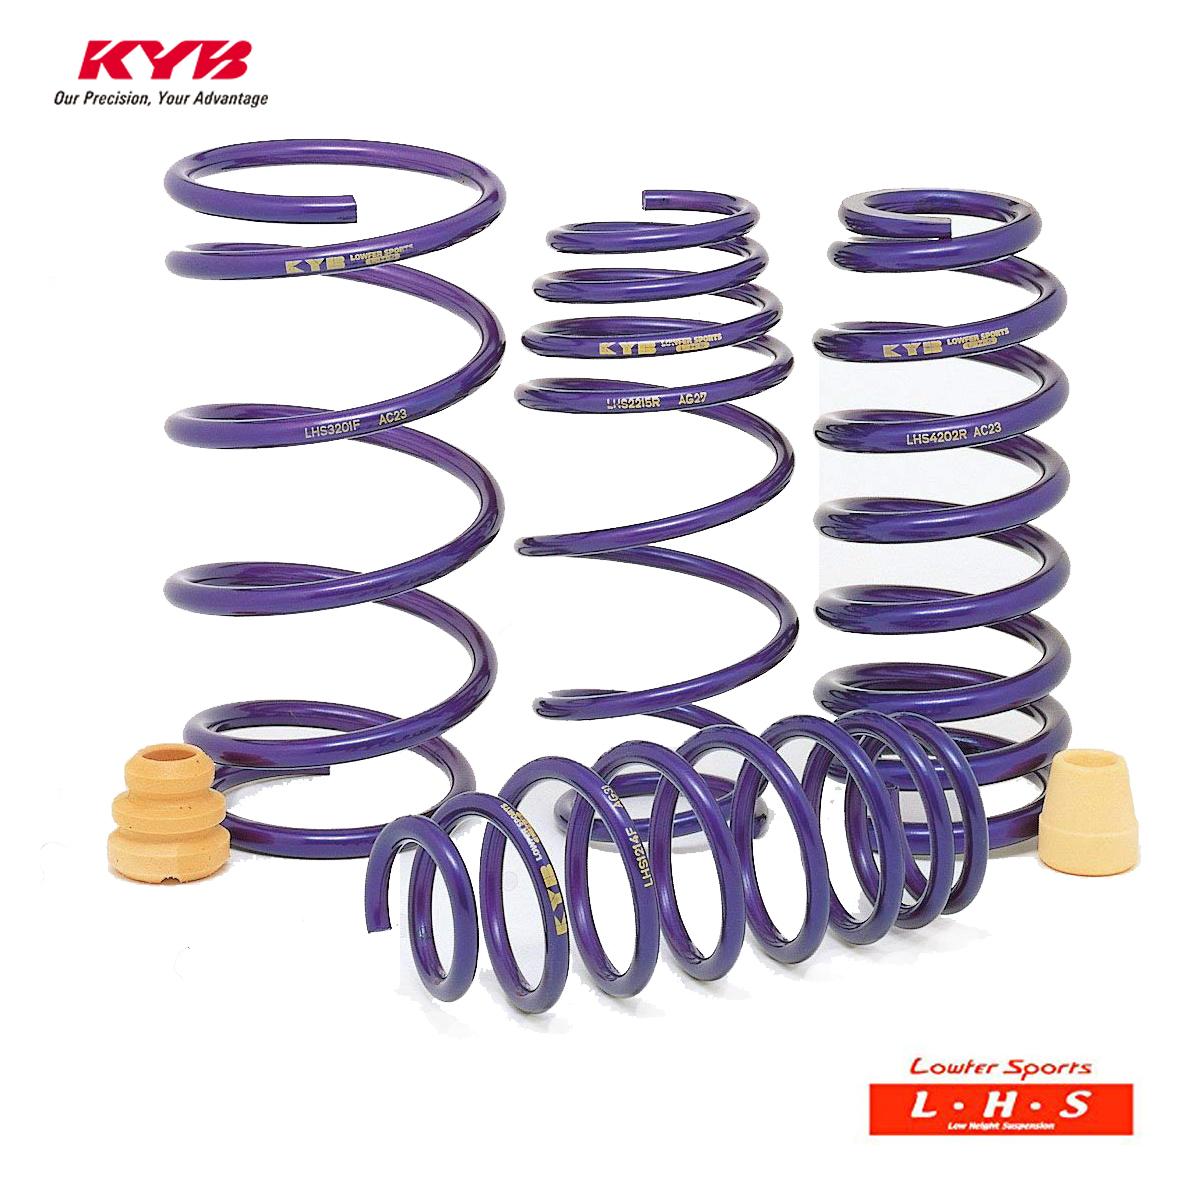 KYB カヤバ CX-3 DK5AW スプリング ダウンサス セット Lowfer Sports LHS-DK5AW 配送先条件有り